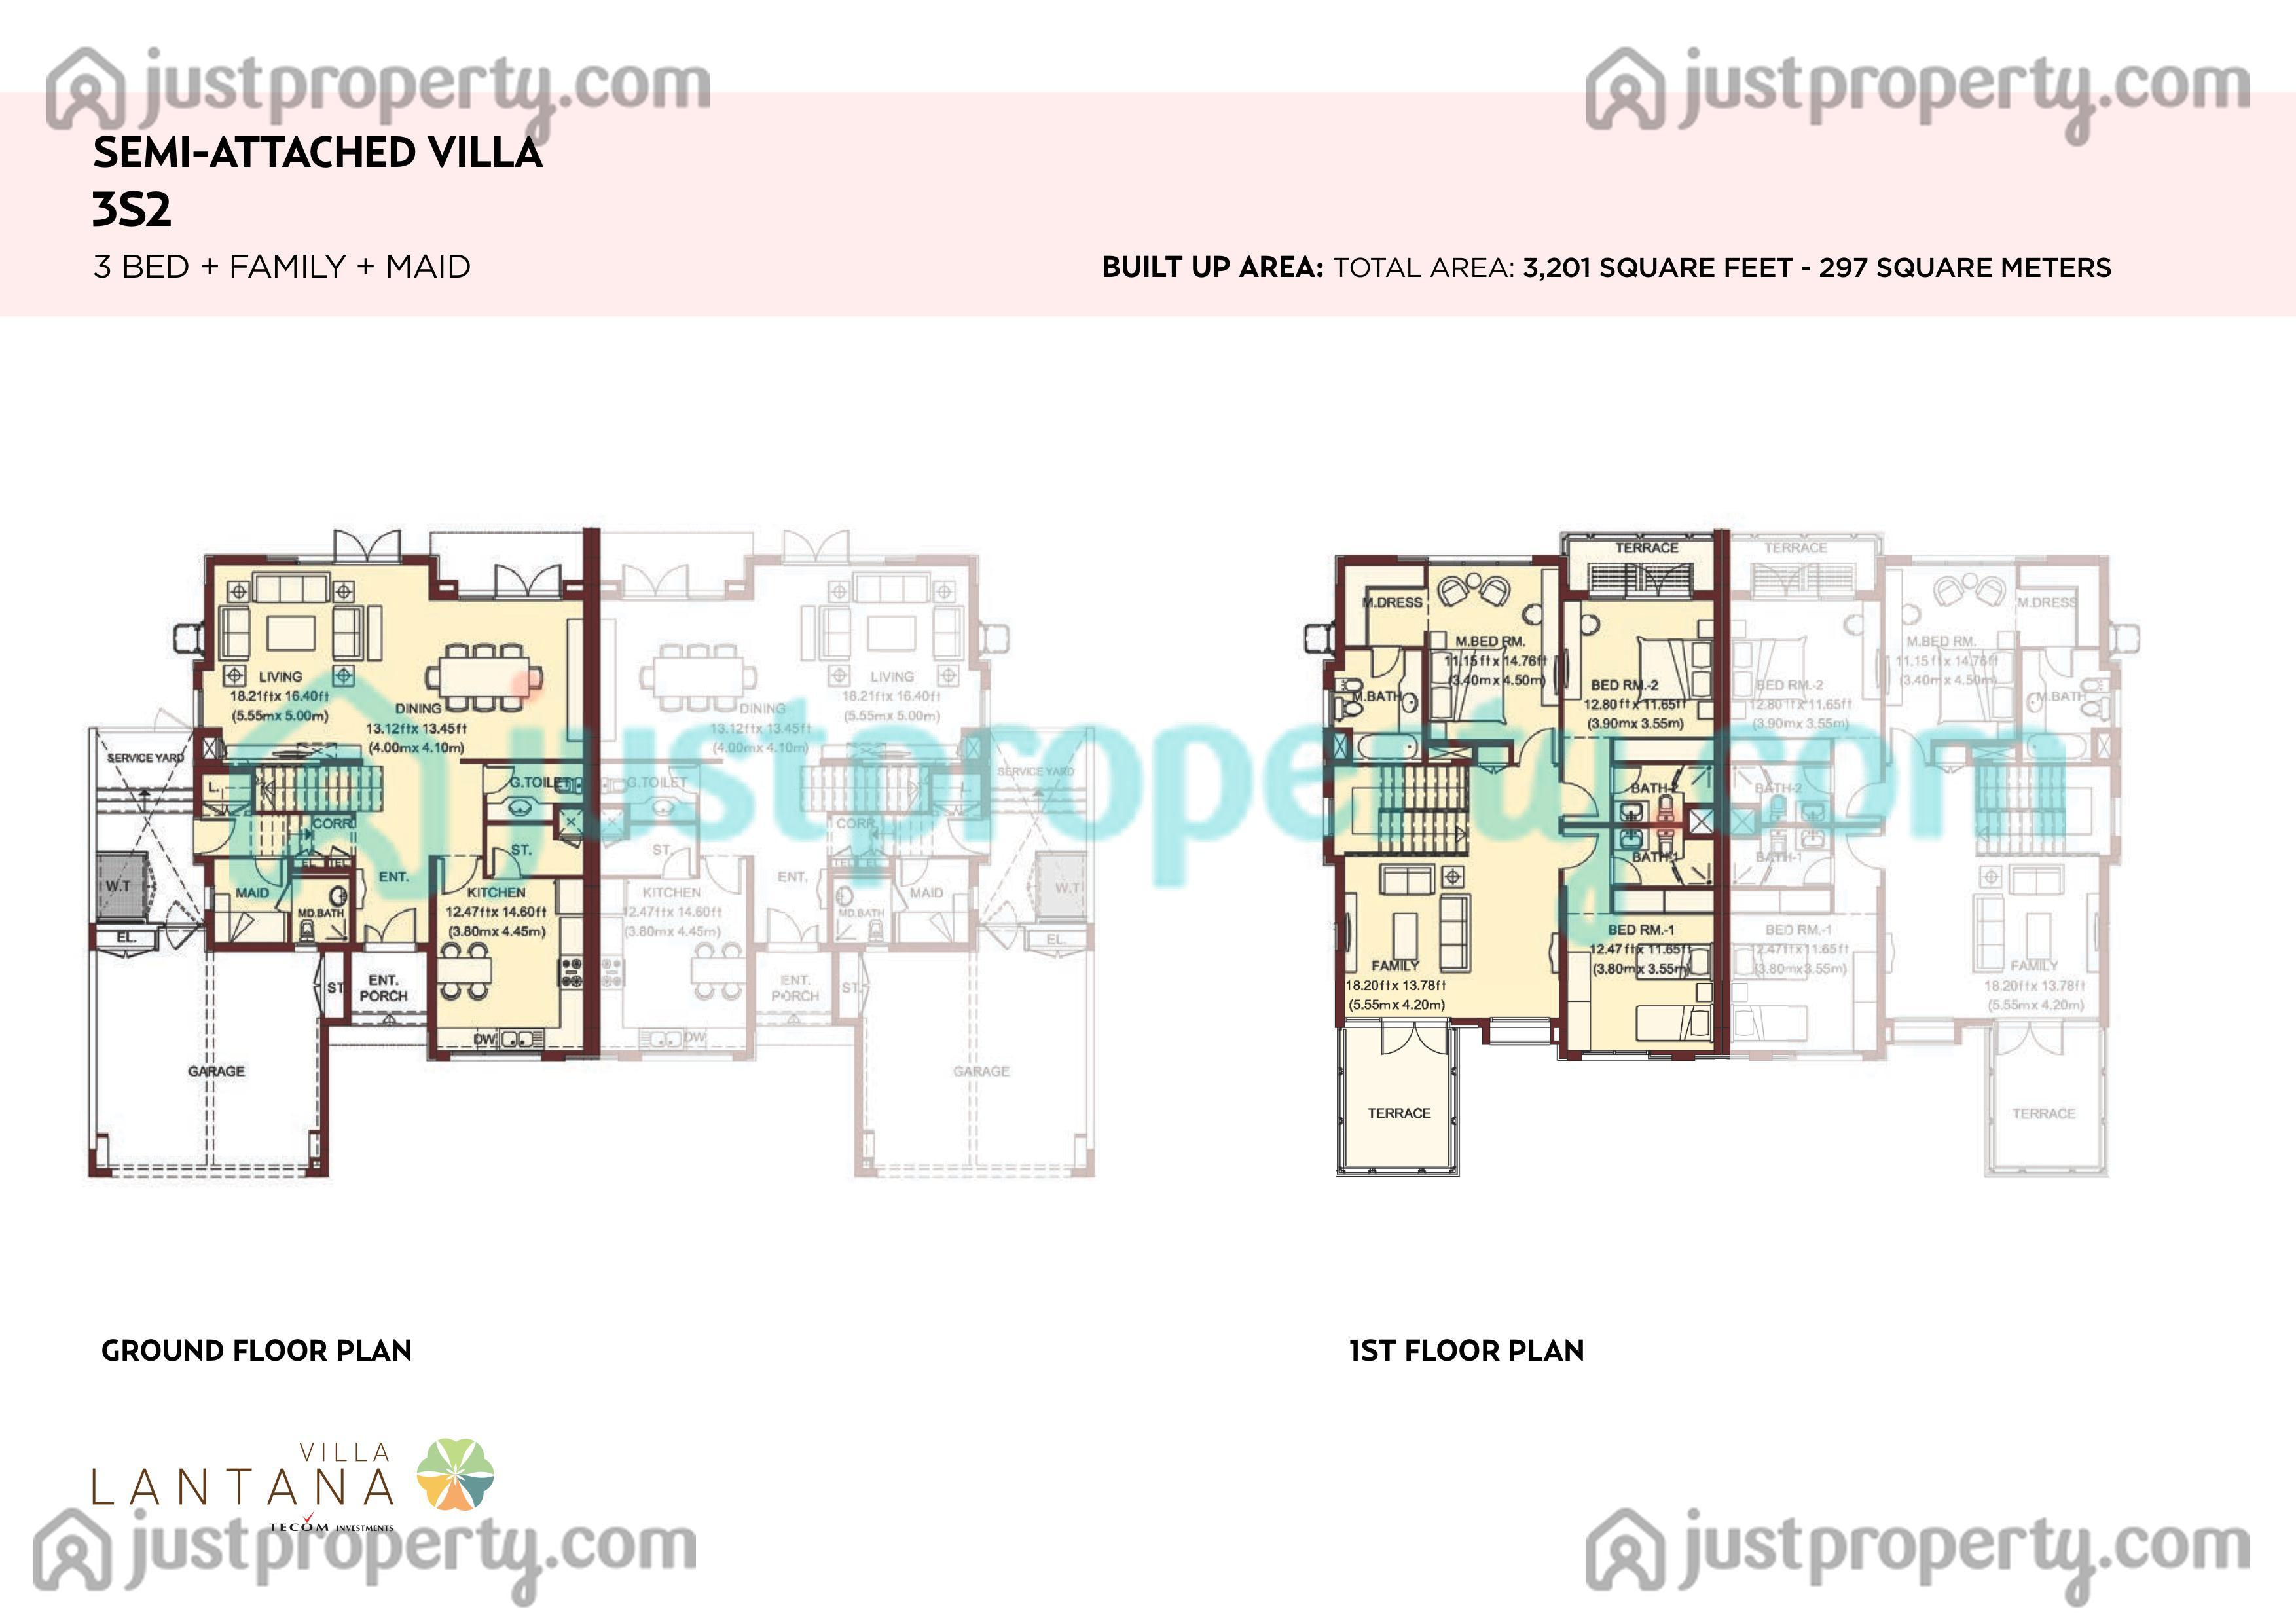 lantana villas floor plans justproperty com find sun city grand lantana floor plans leolinda bowers